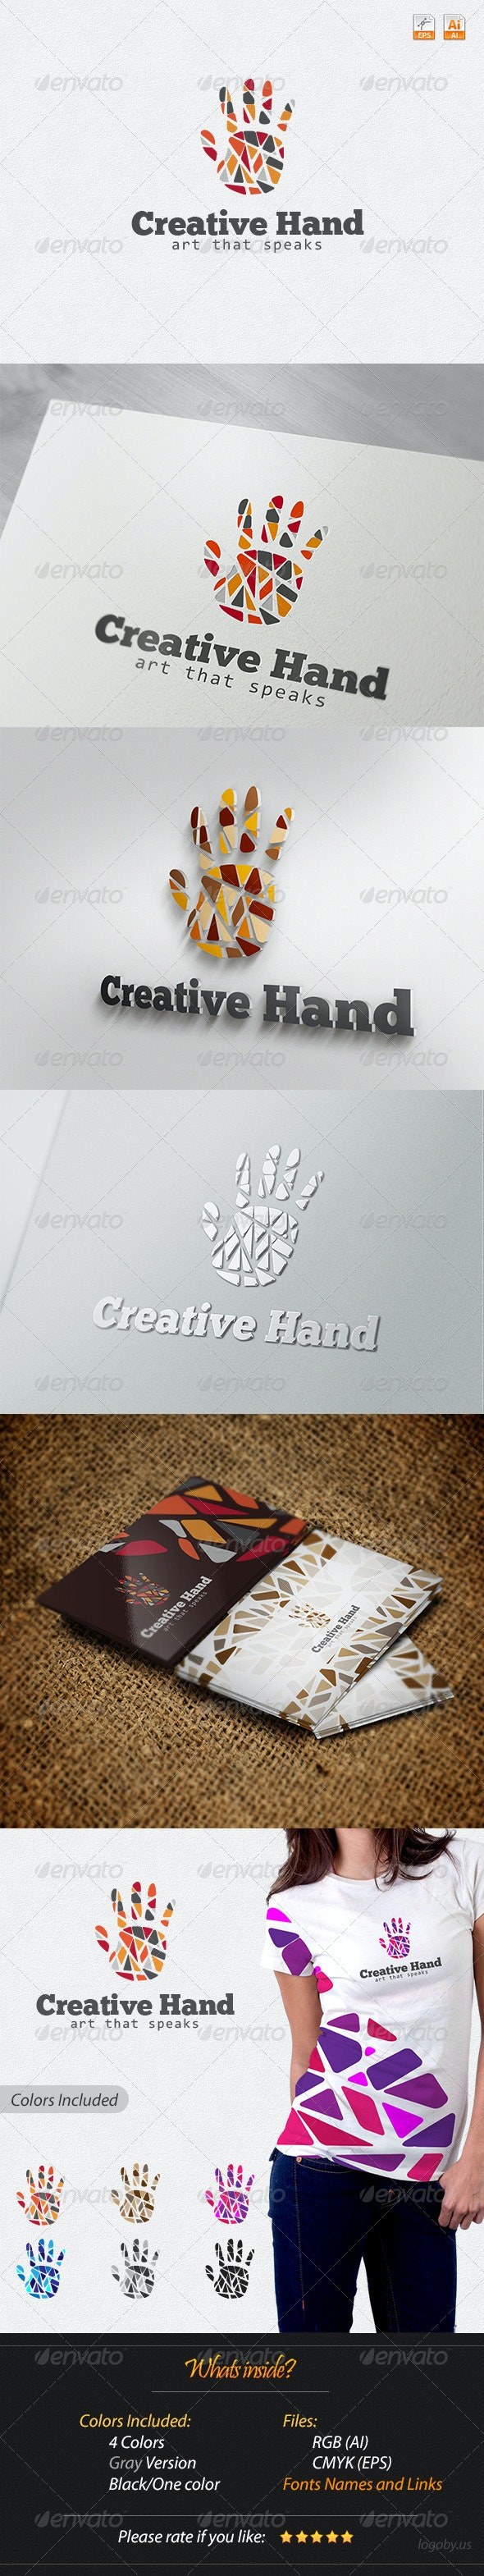 Creative Hand - Art that Speaks Logo - Humans Logo Templates